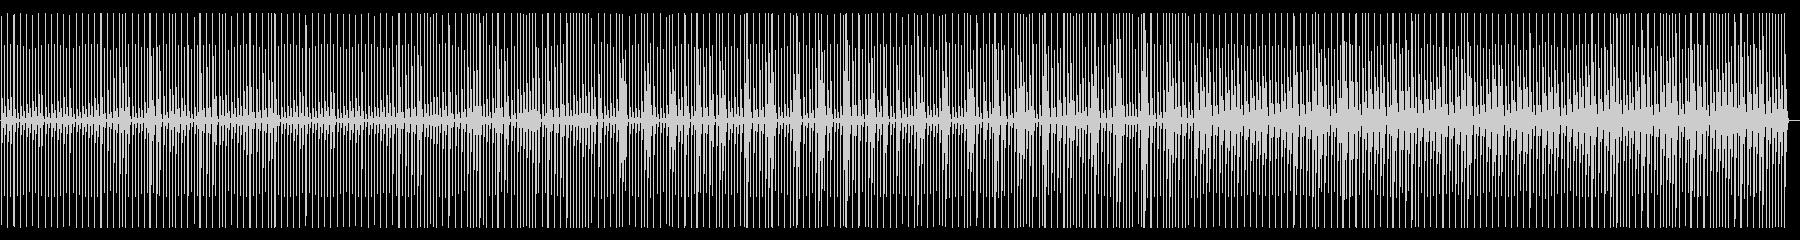 YouTube 木琴ソロ・シンプルの未再生の波形